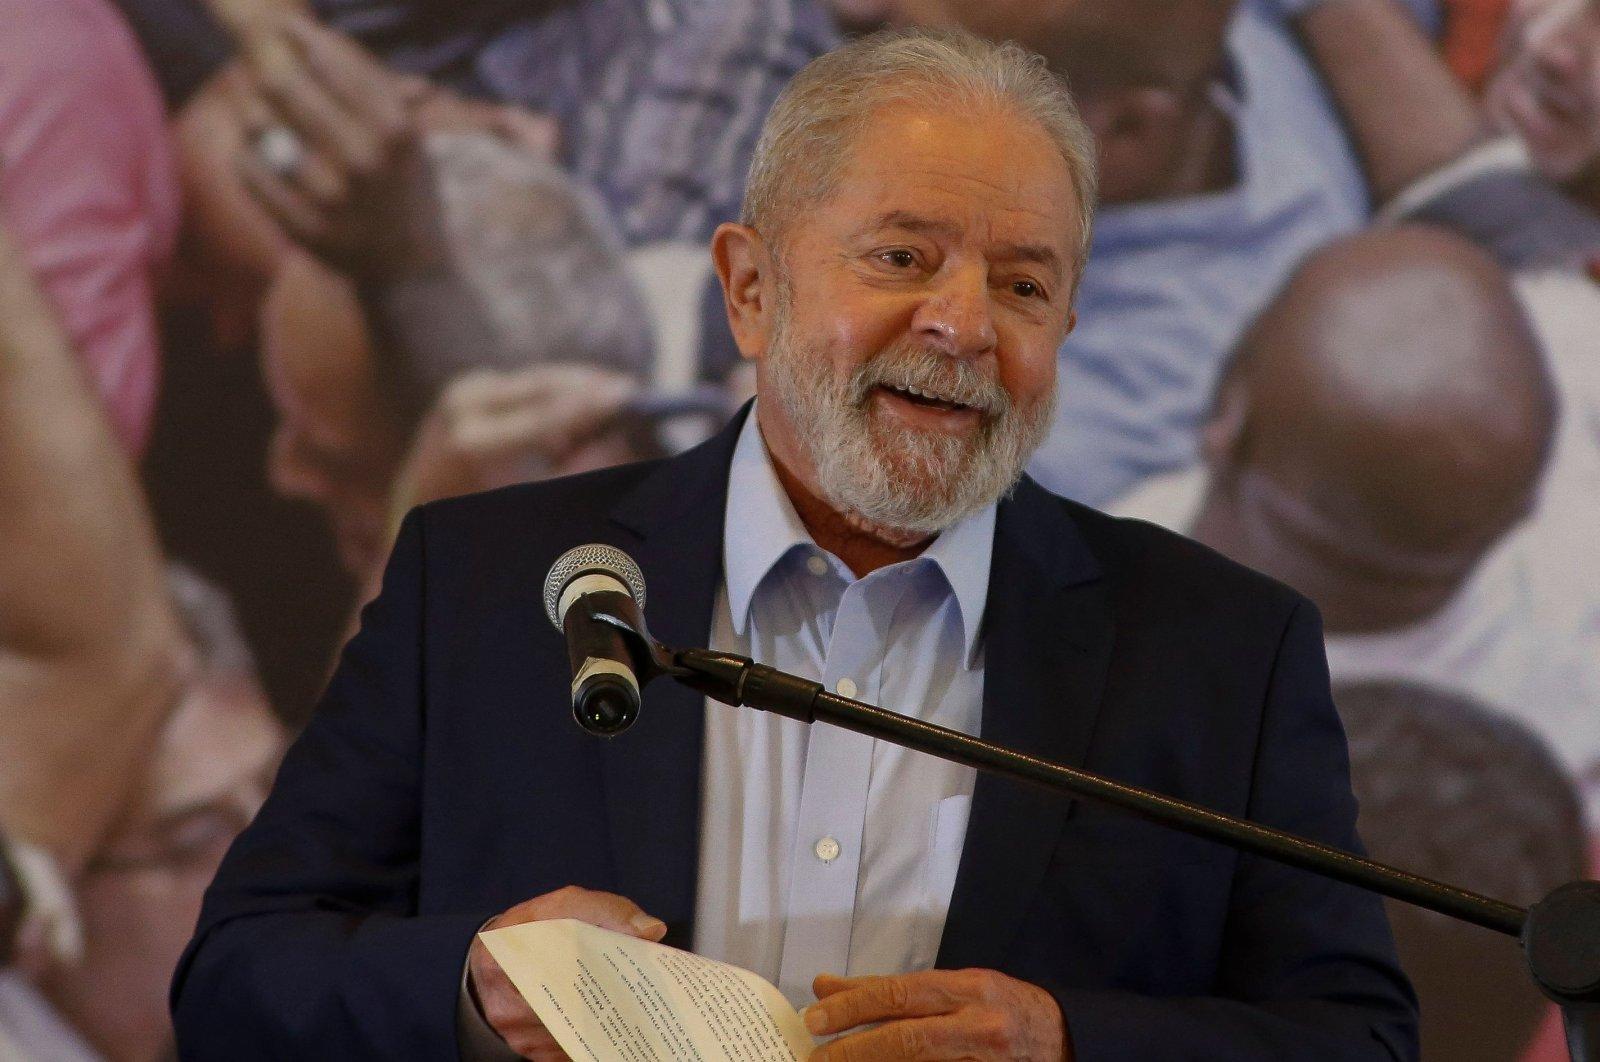 Brazilian former president (2003-2011) Luiz Inacio Lula da Silva, delivers a press conference at the metalworkers' union building in Sao Bernardo do Campo, in metropolitan Sao Paulo, Brazil, March 10, 2021. (AFP Photo)